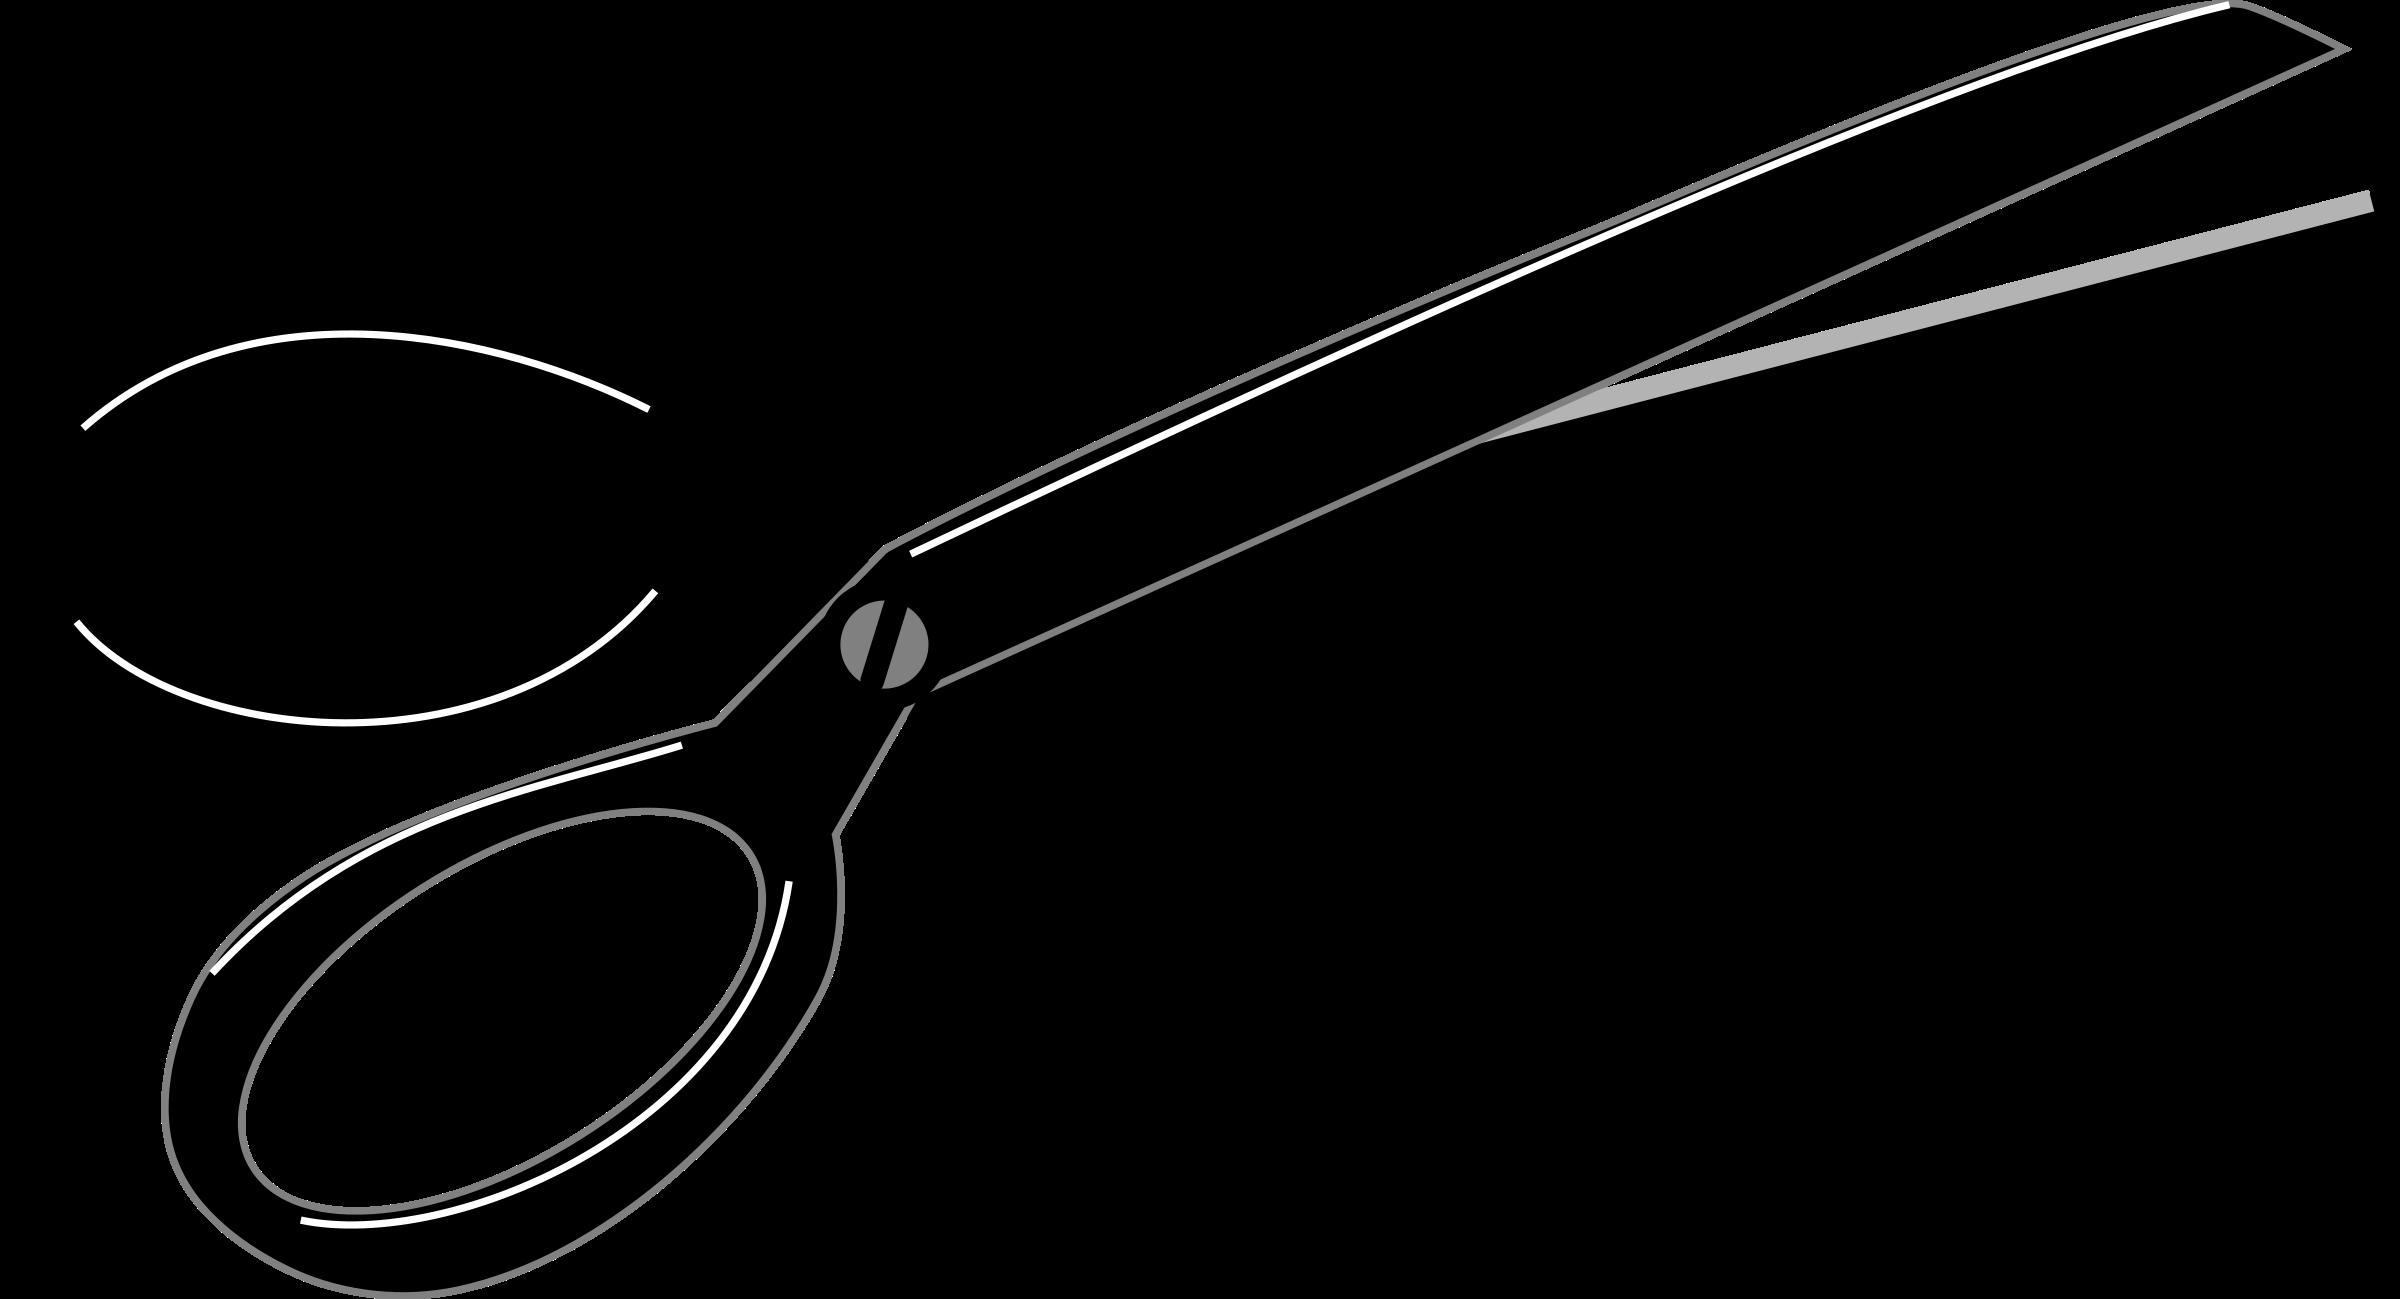 Scissors PNG Image - Scissors HD PNG